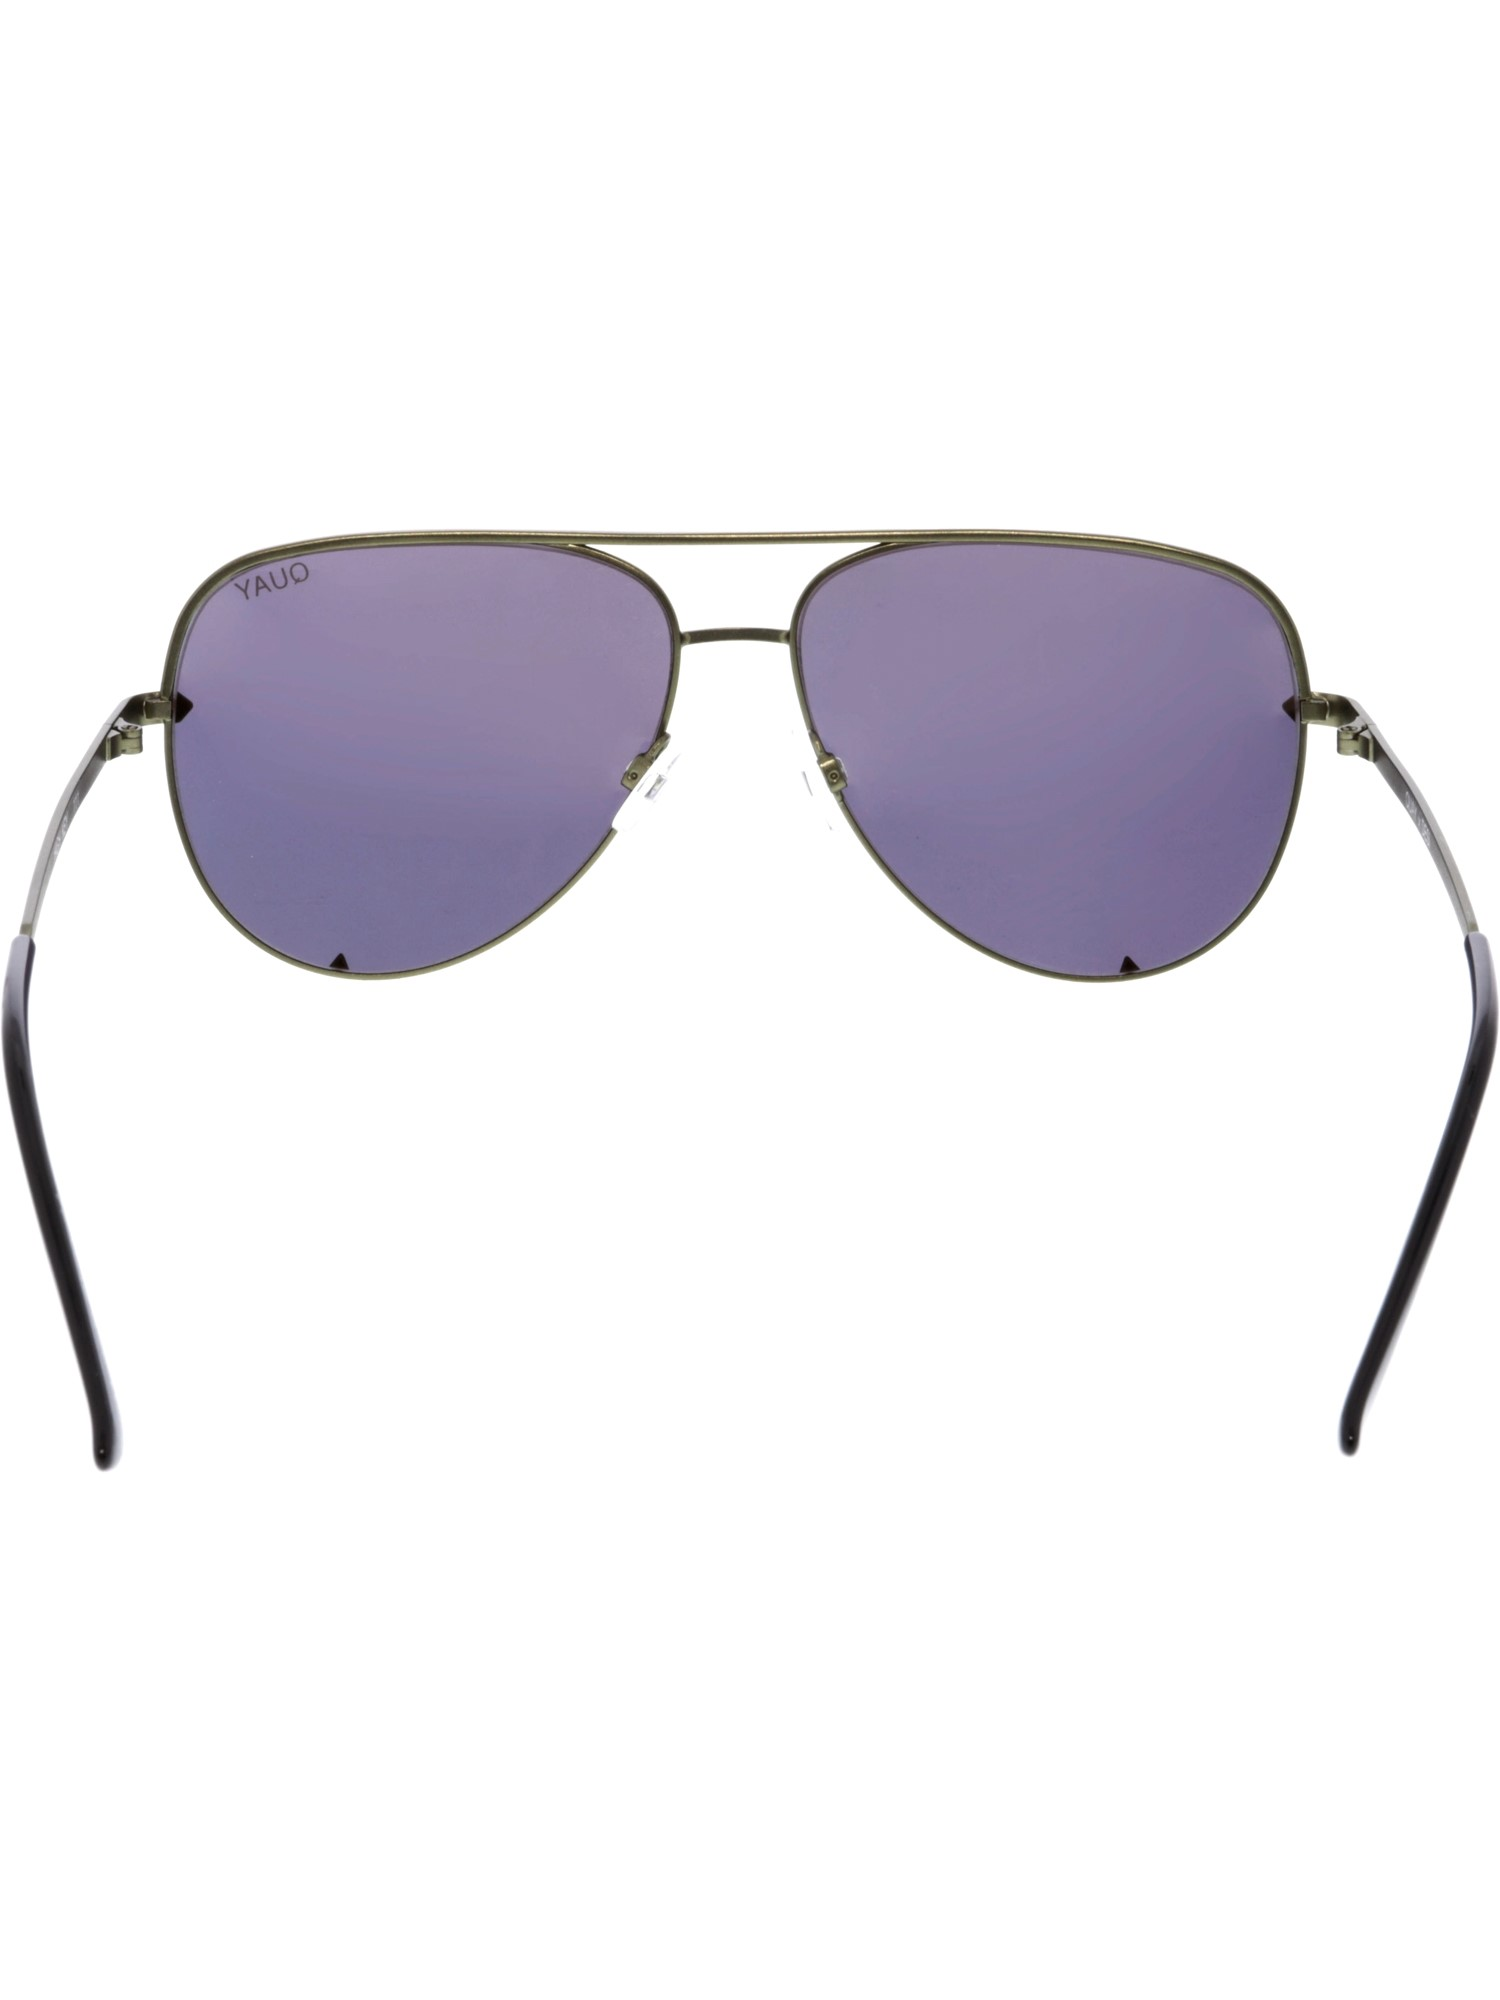 a8994fd309 Quay - QUAY Australia X Desi Perkins HIGH KEY GREEN   GOLD MIRROR LENS  Sunglasses - Walmart.com